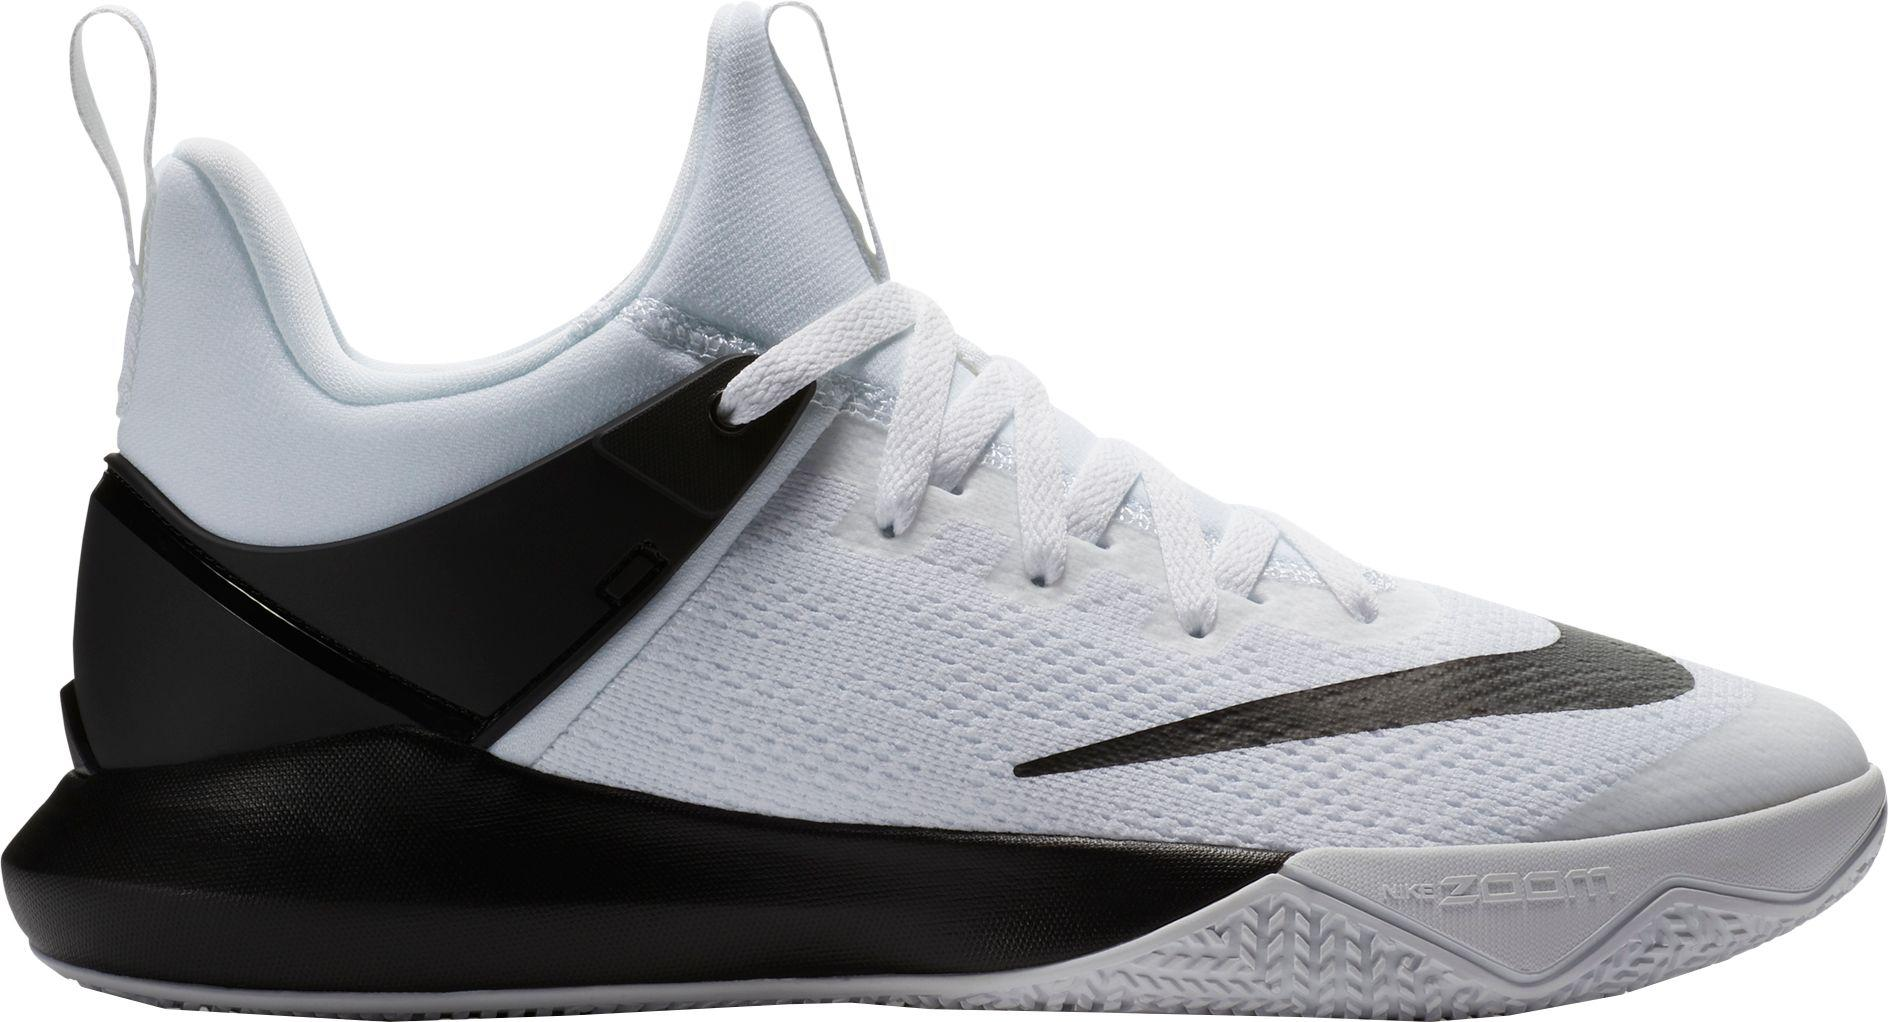 Dicks Sporting Nike Shoes